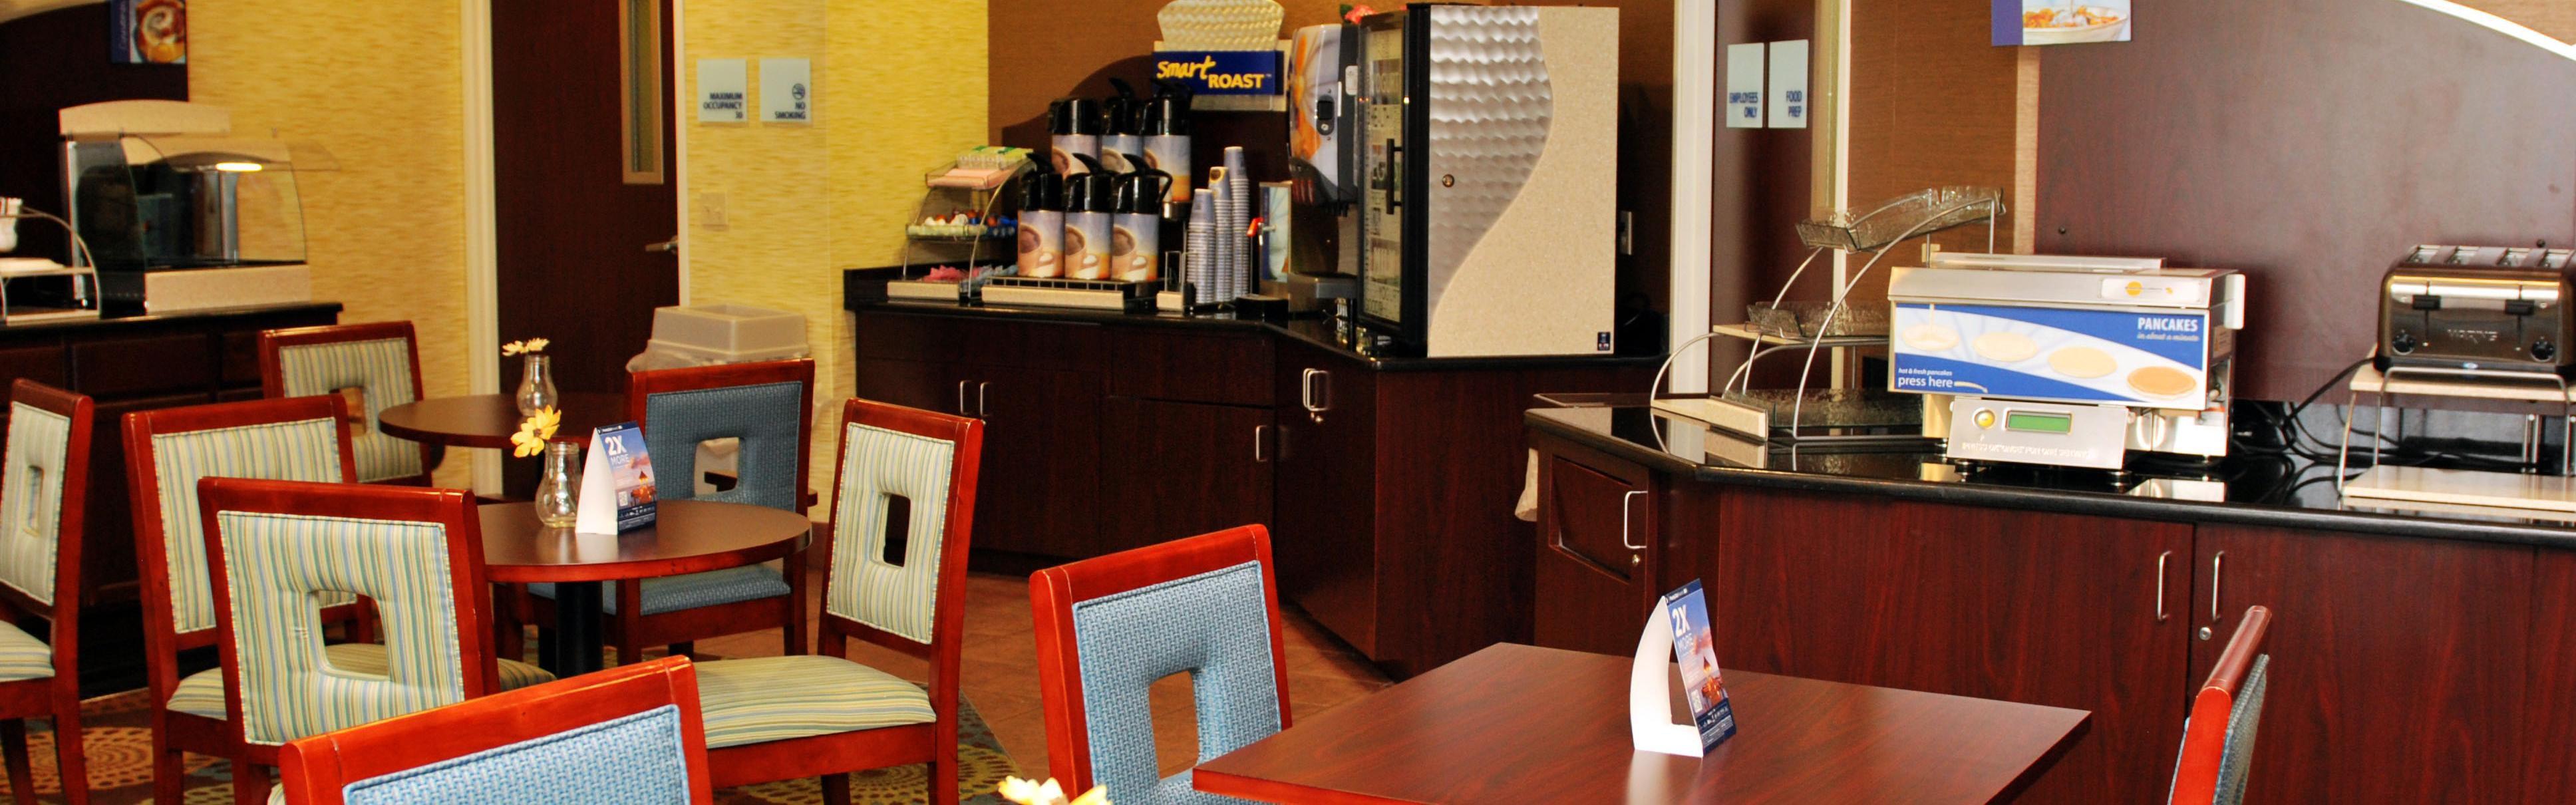 Holiday Inn Express Lapeer image 3